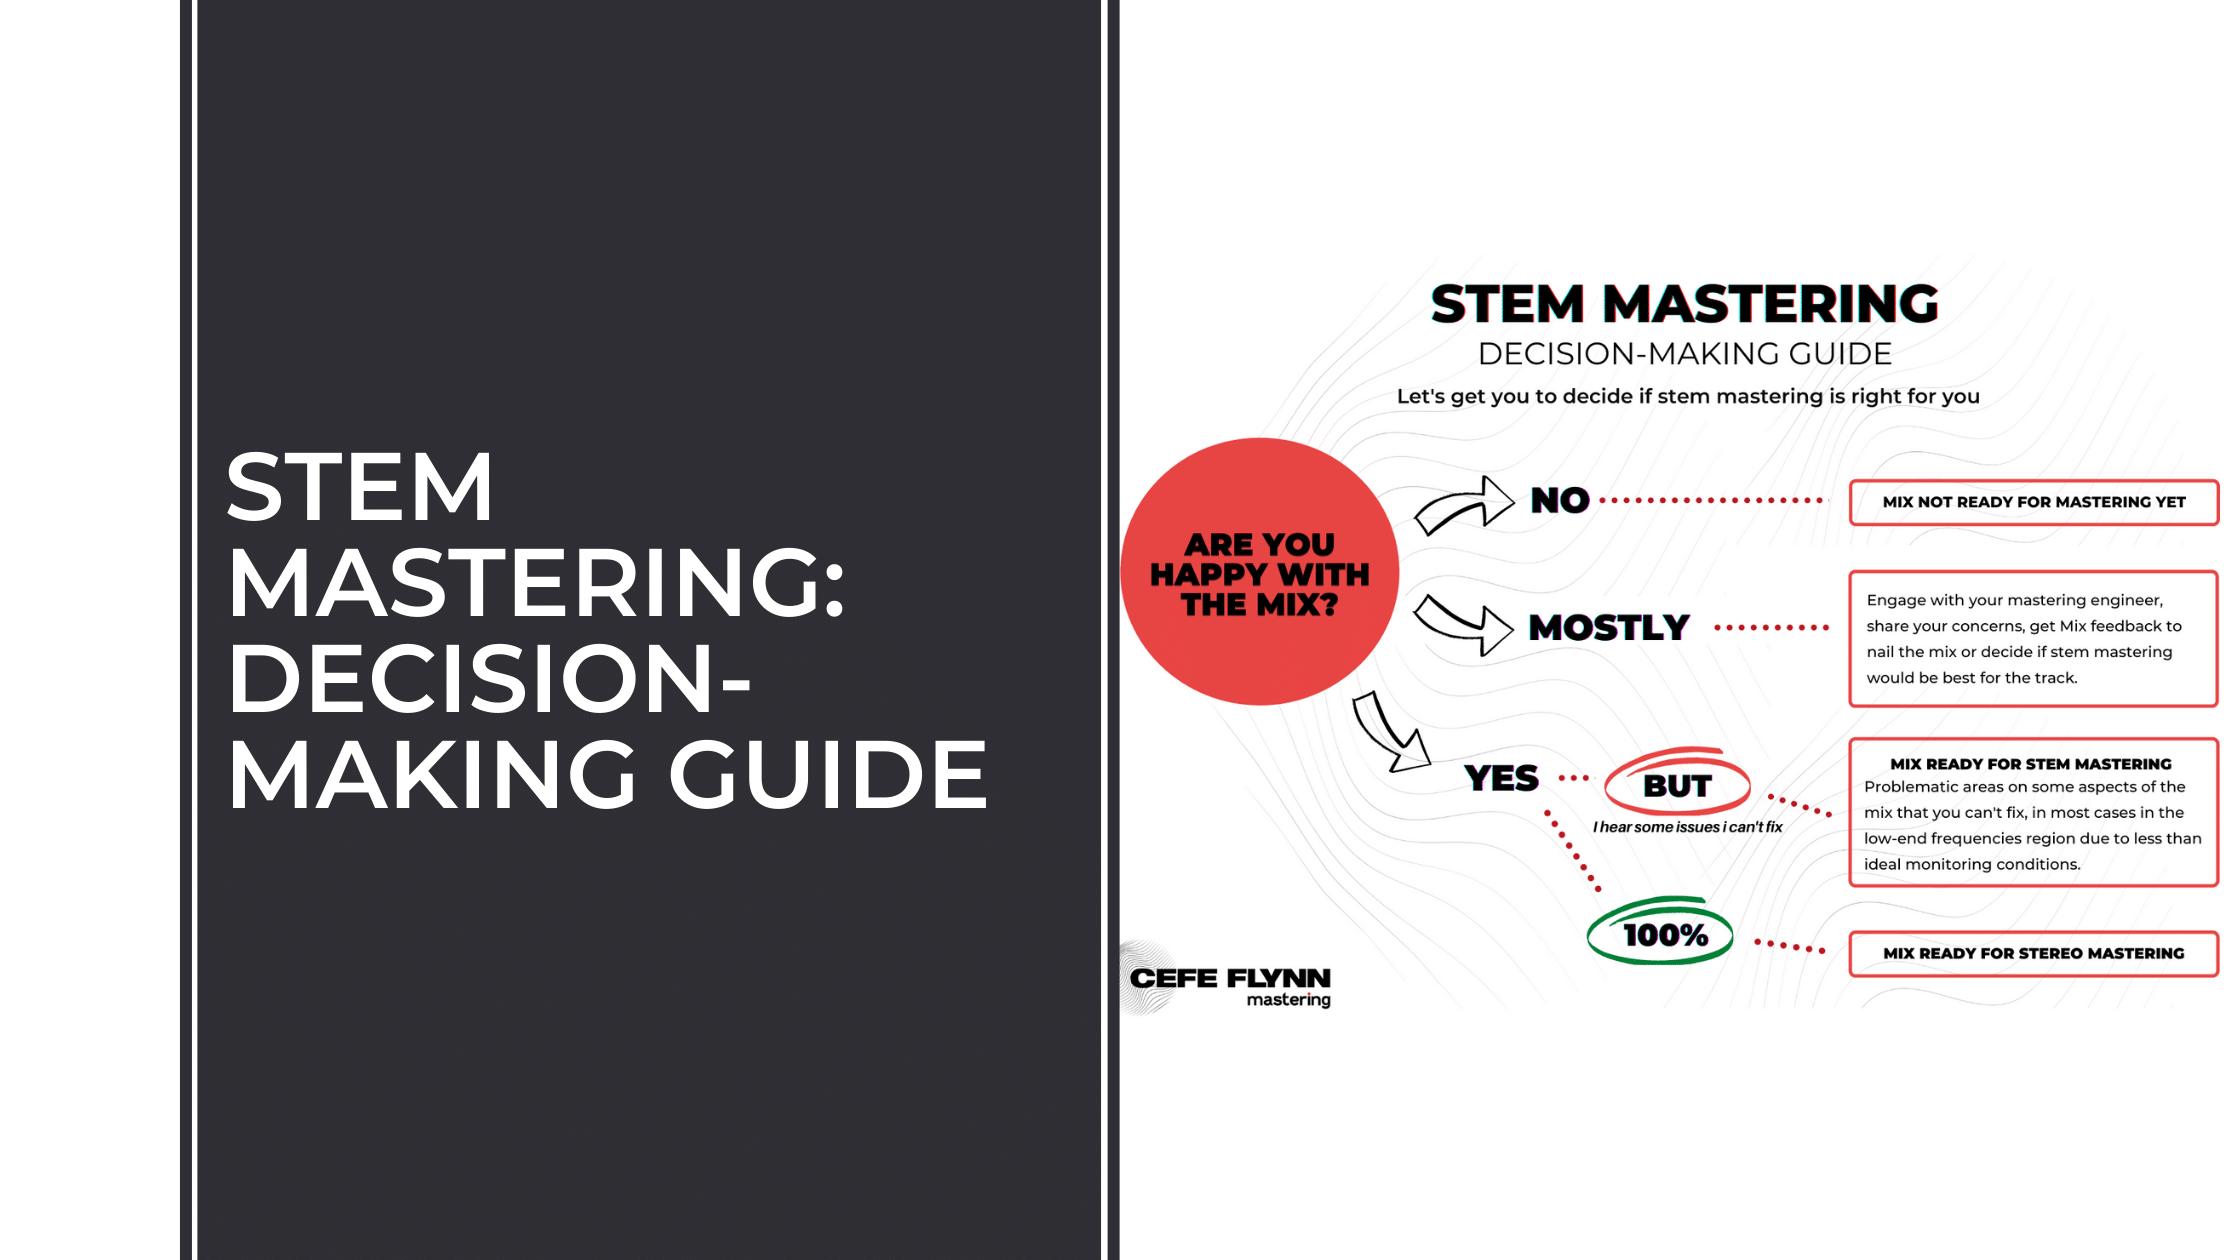 Stem Mastering: Decision-Making Guide